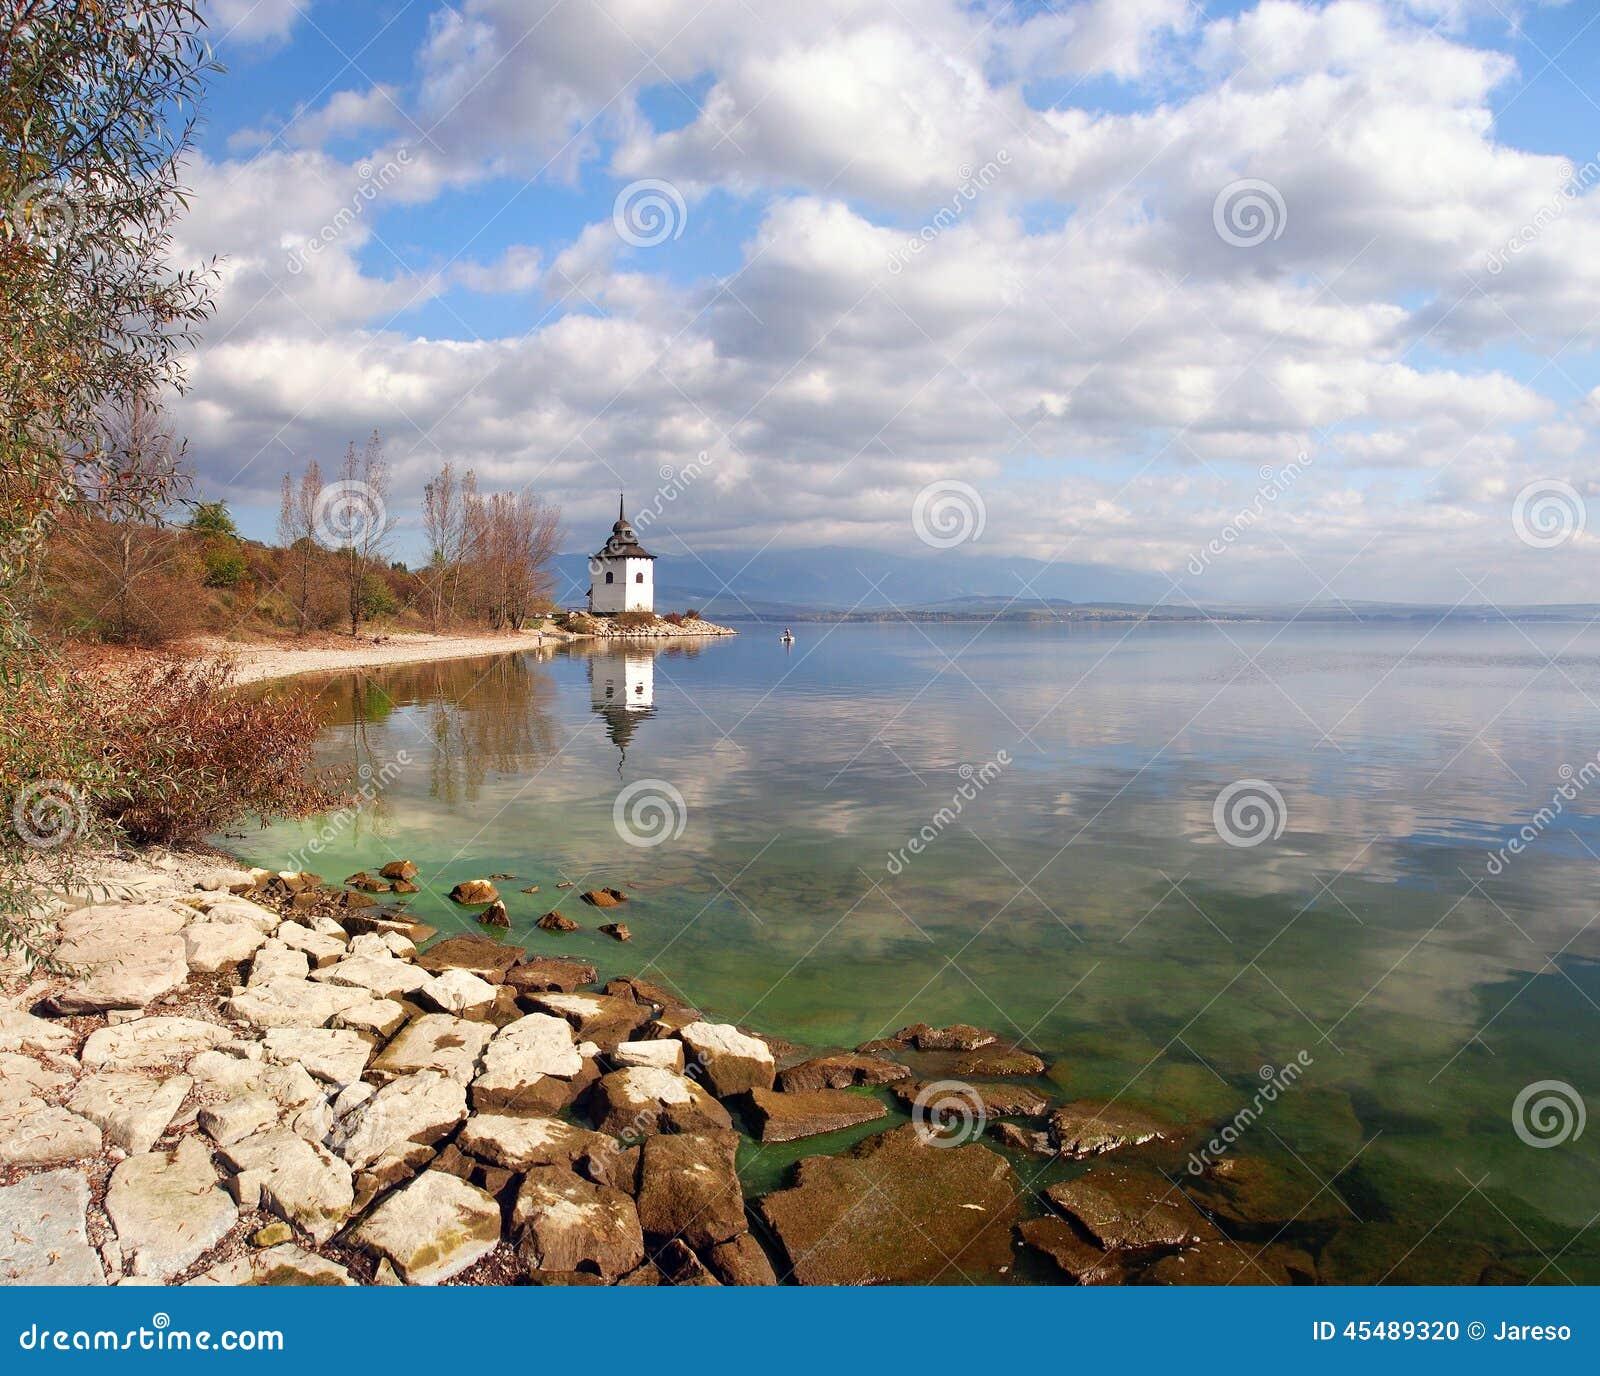 Liptovska玛拉湖,斯洛伐克的秋天岸